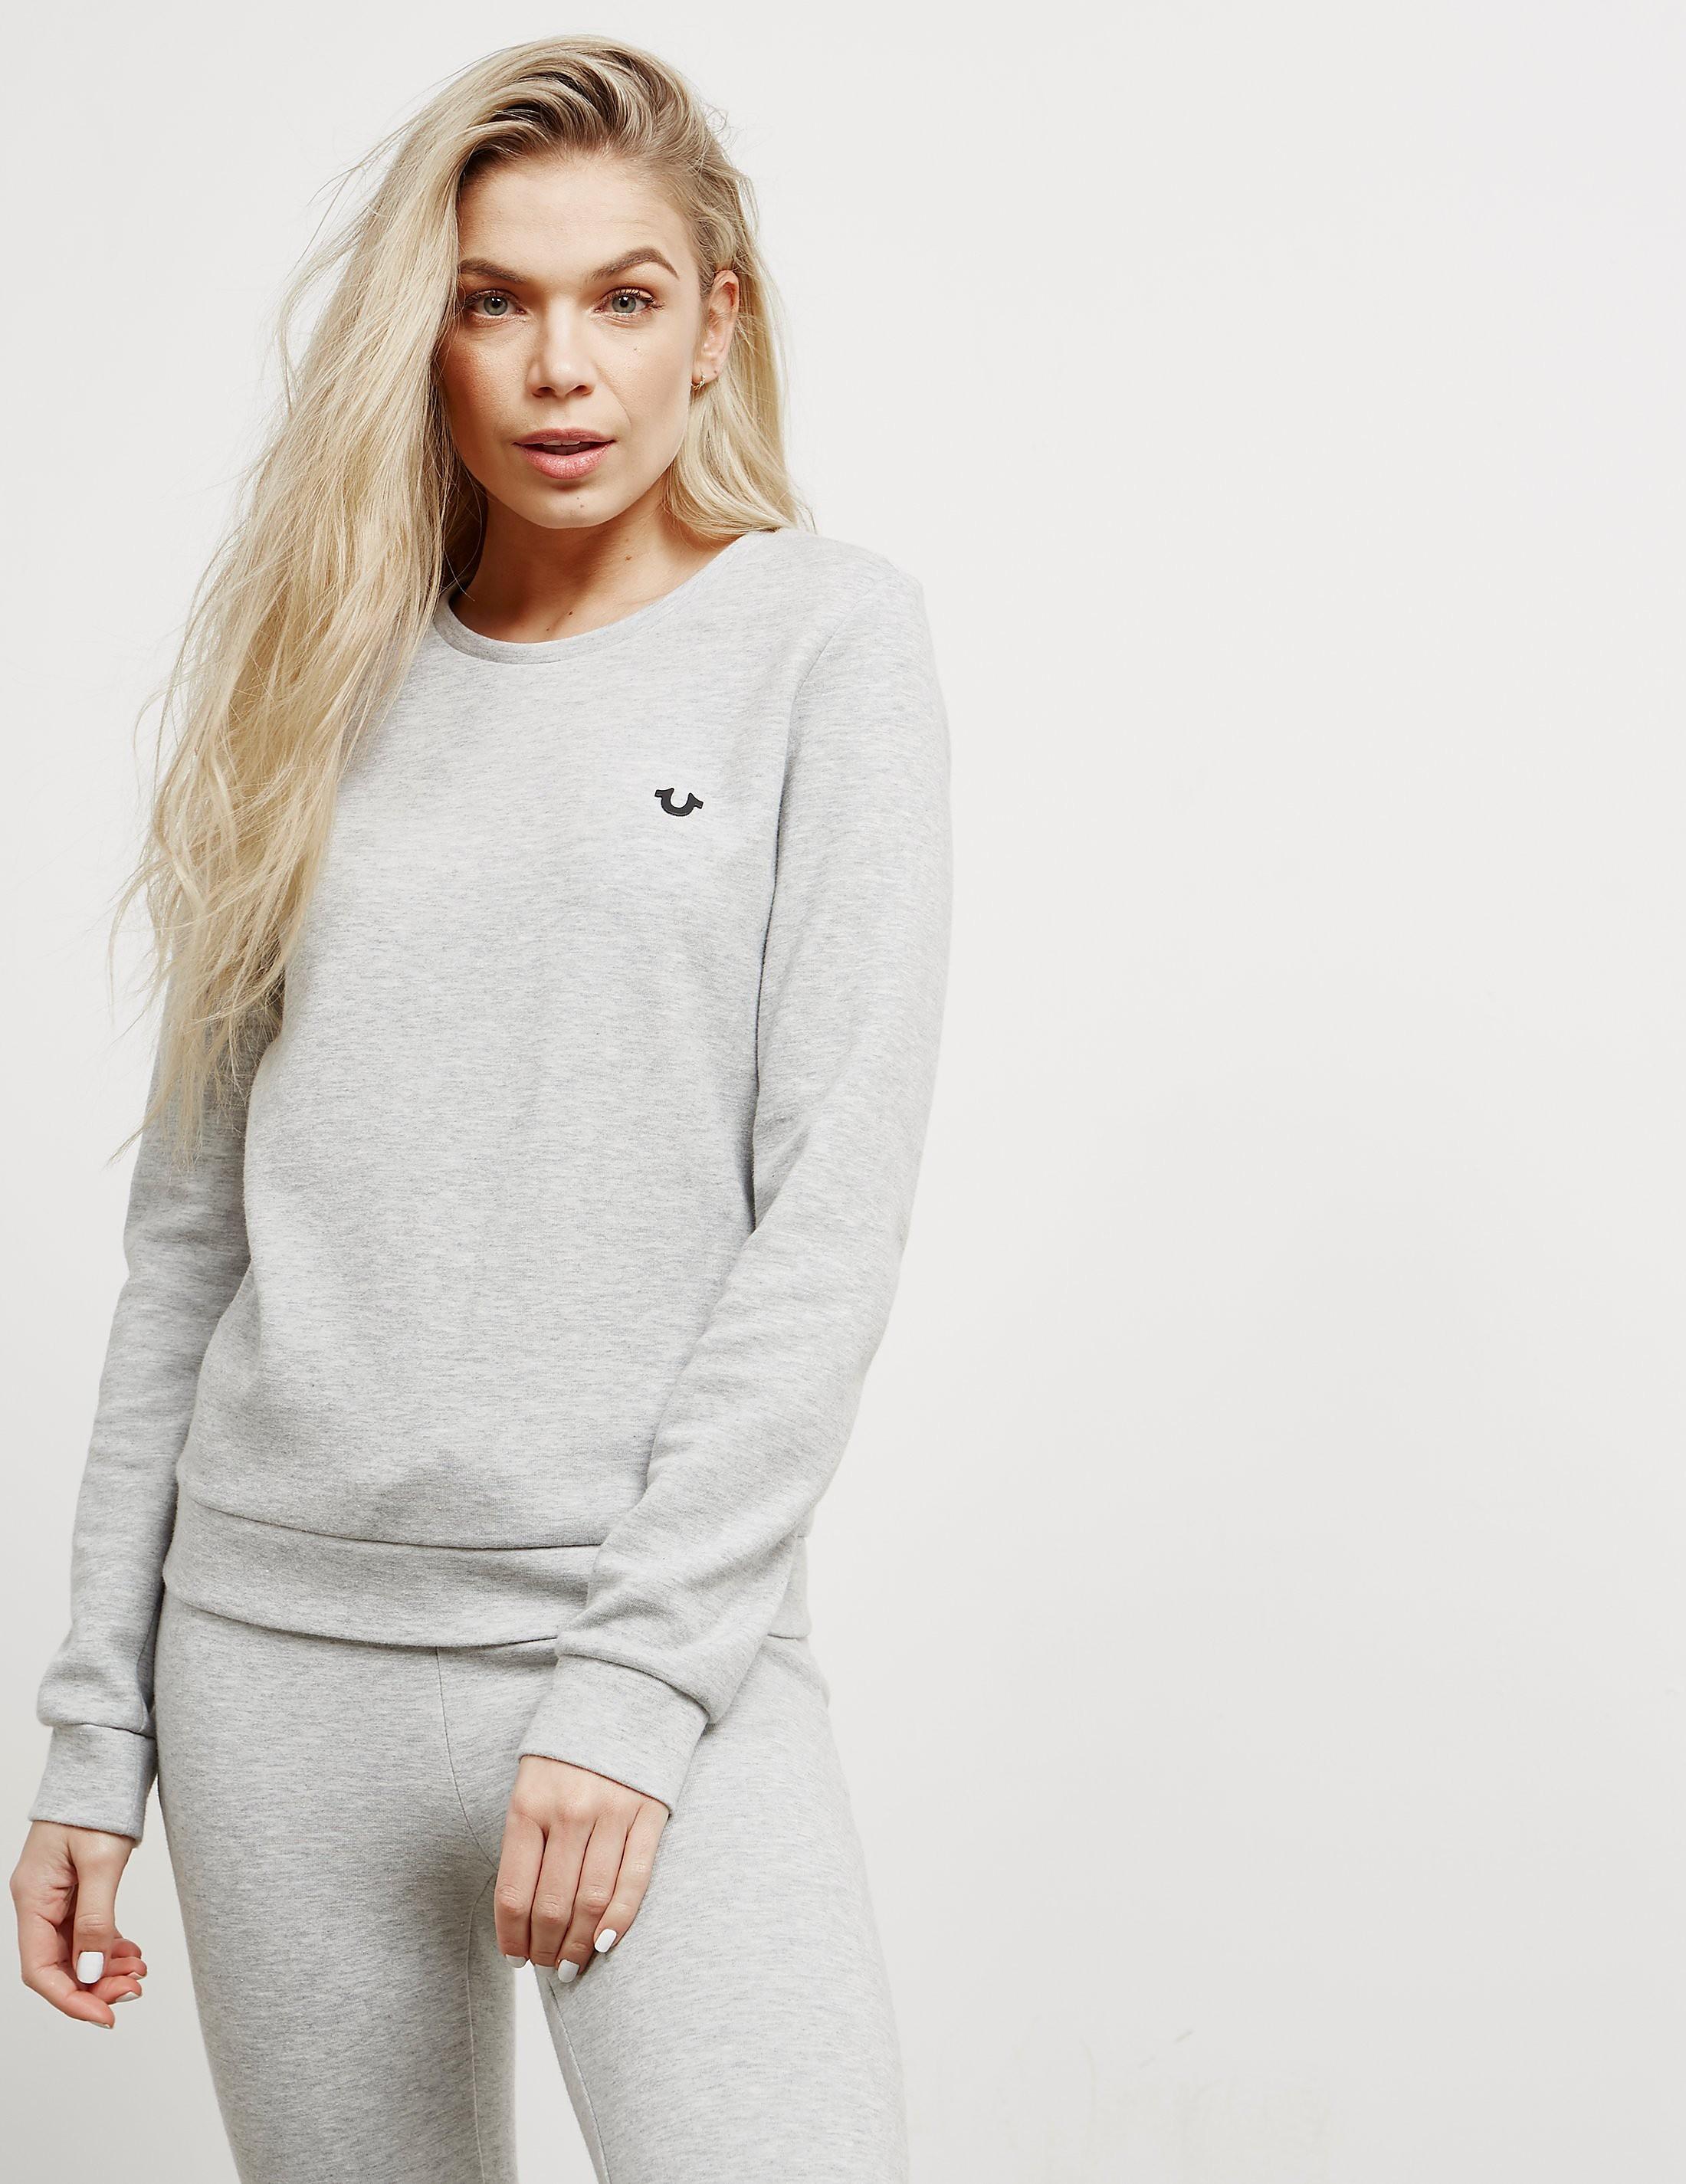 True Religion Crew Sweatshirt